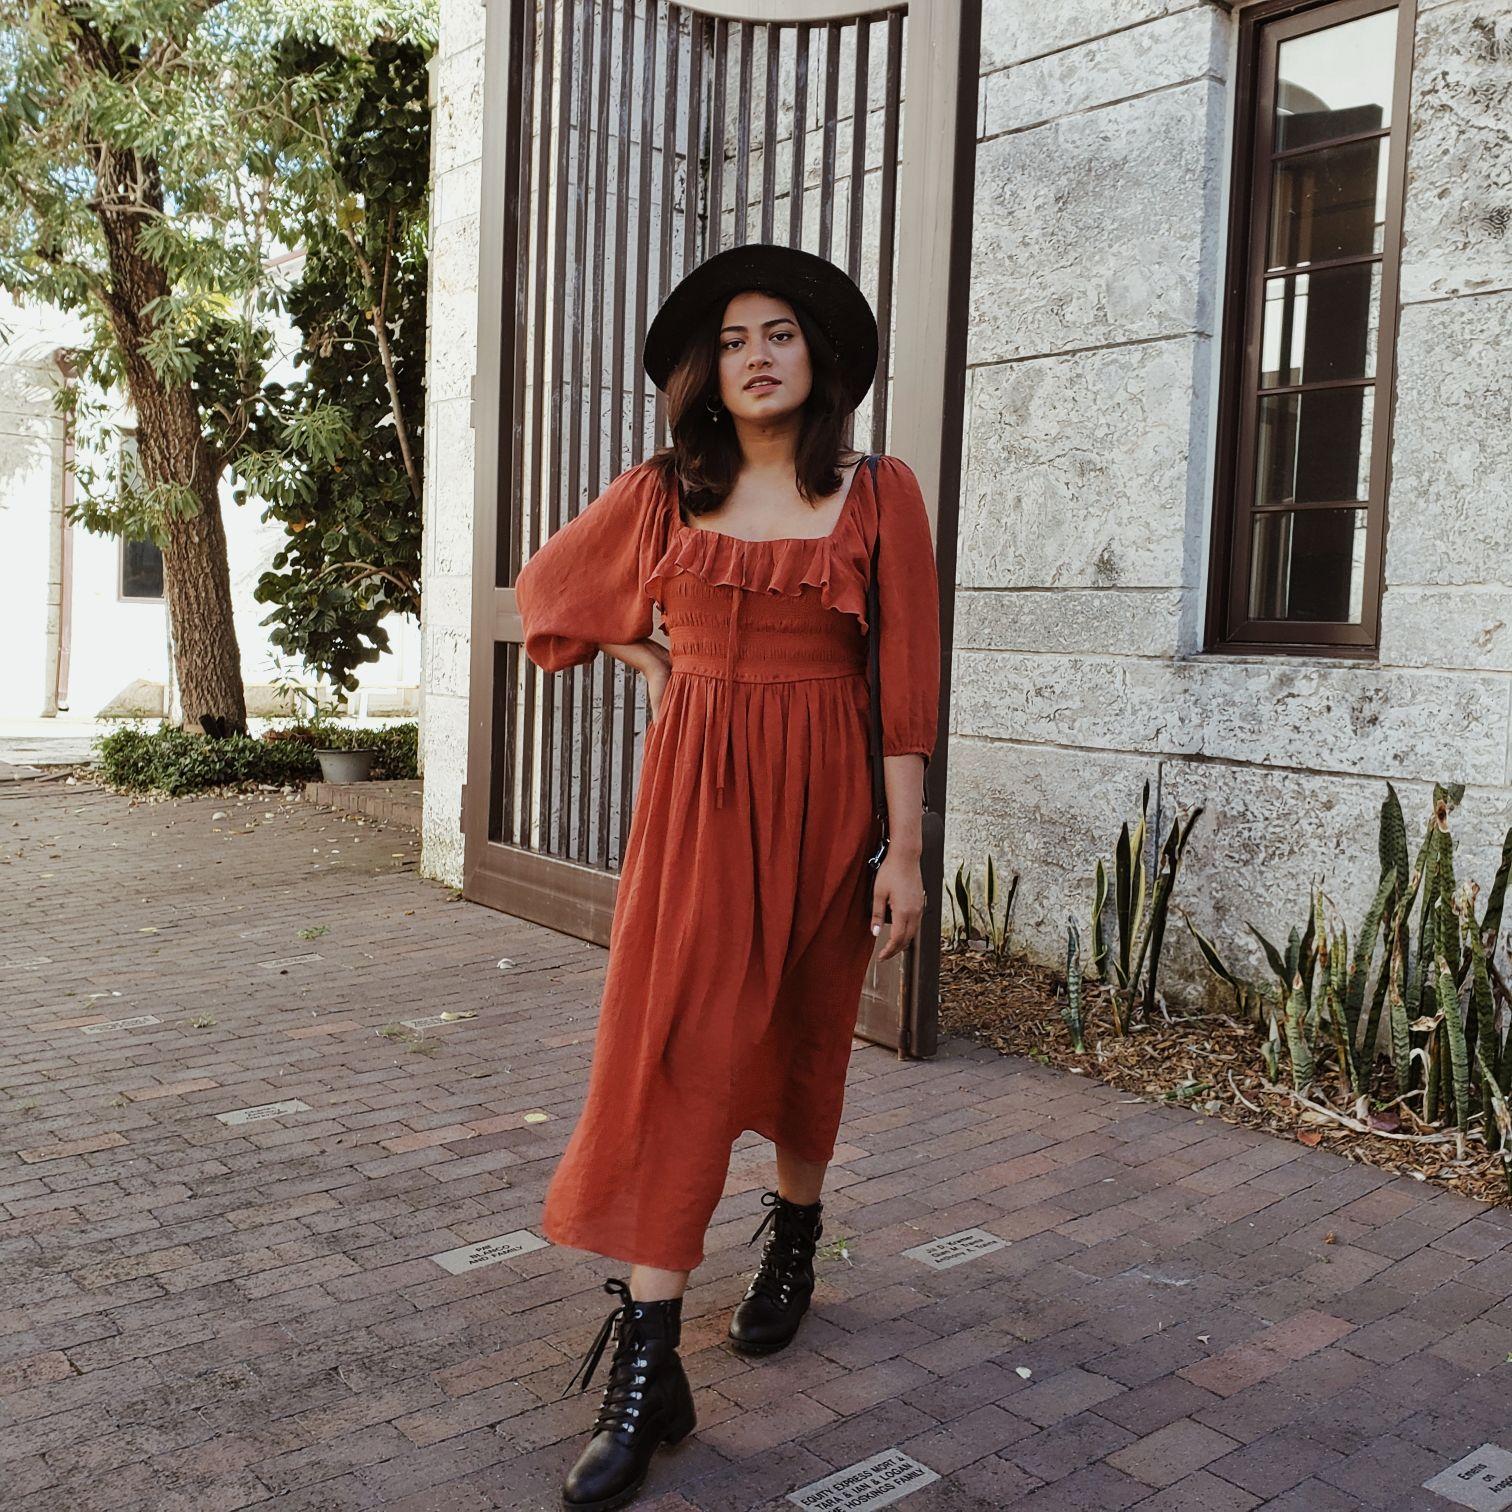 Bangladeshi American Fashion Blogger Afroza Khan in Miami wearing Boho Burnt Orange Dress